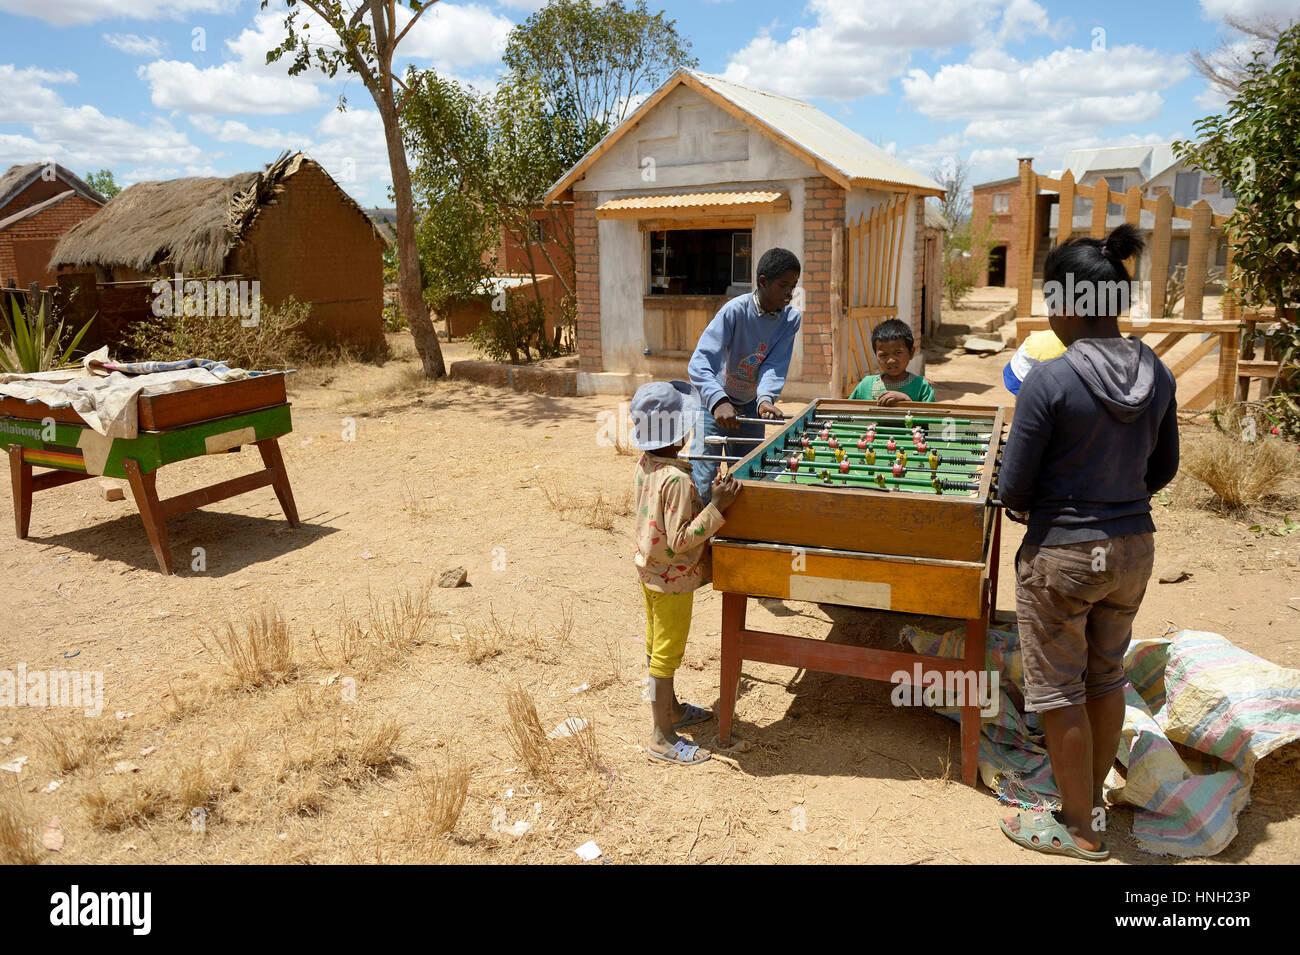 Children playing table football, Avarabohitra Fenomanano village, Tsiroanomandidy district, Bongolava region, Madagascar - Stock Image